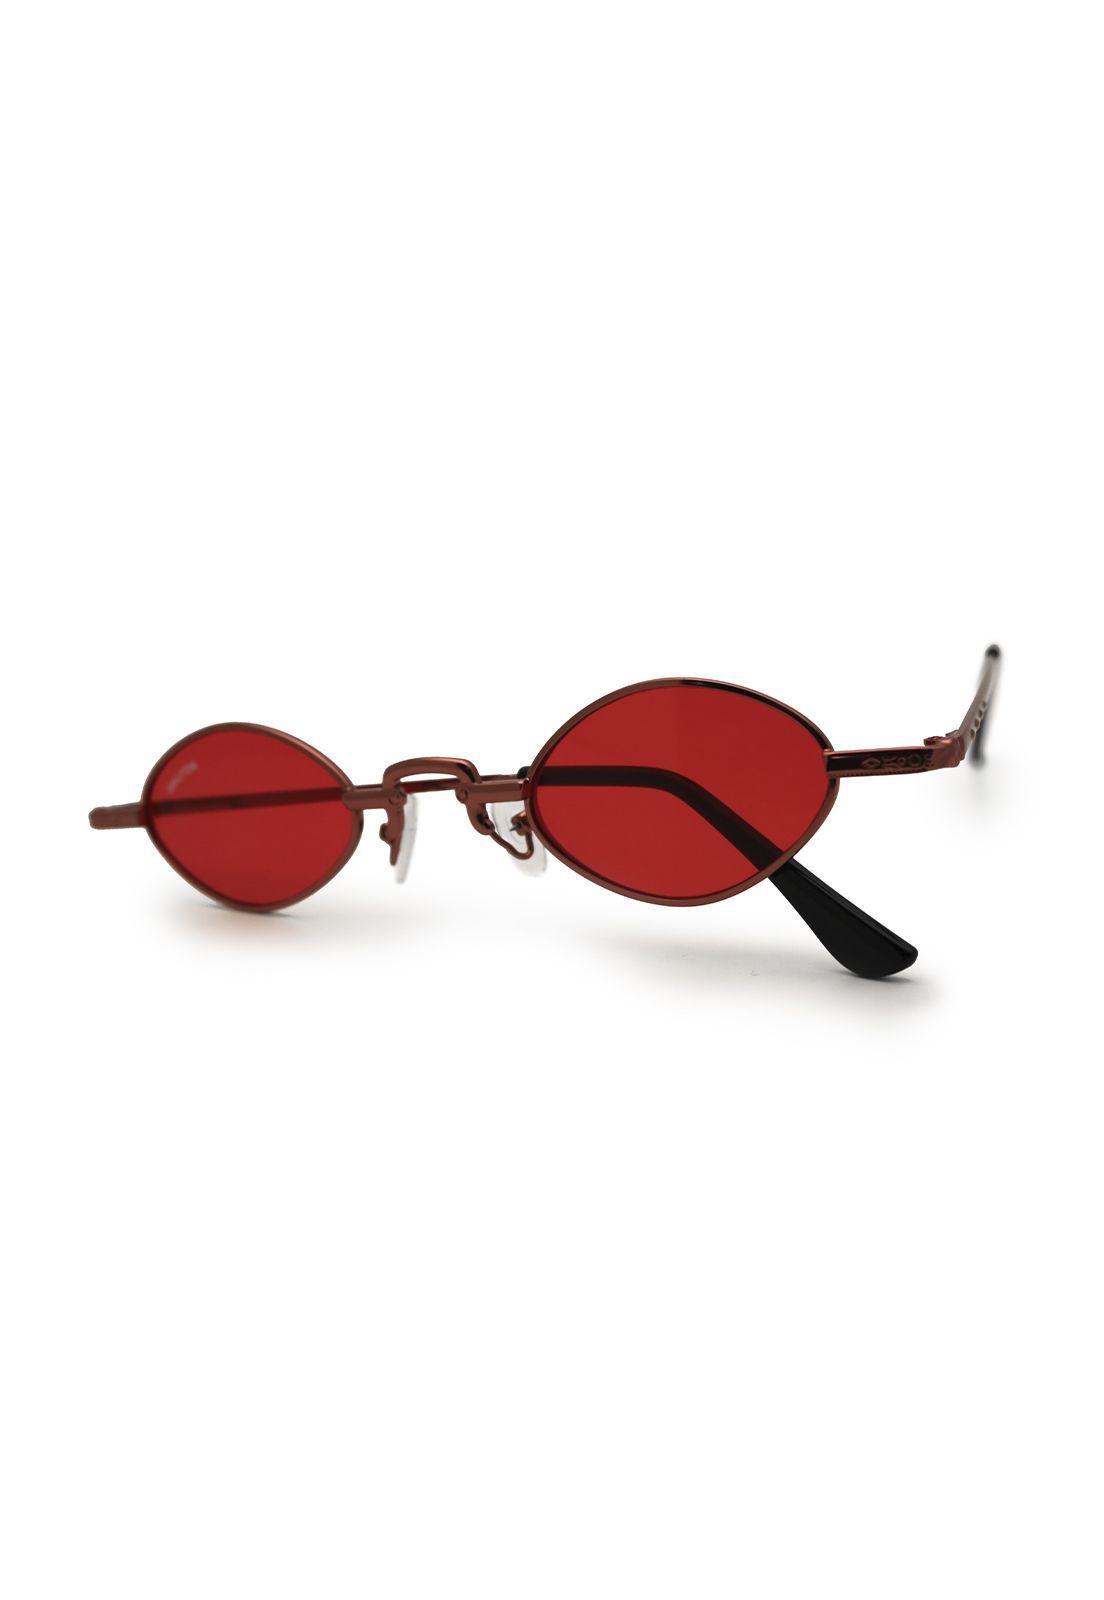 Óculos de Sol Grungetteria Osval Vermelho